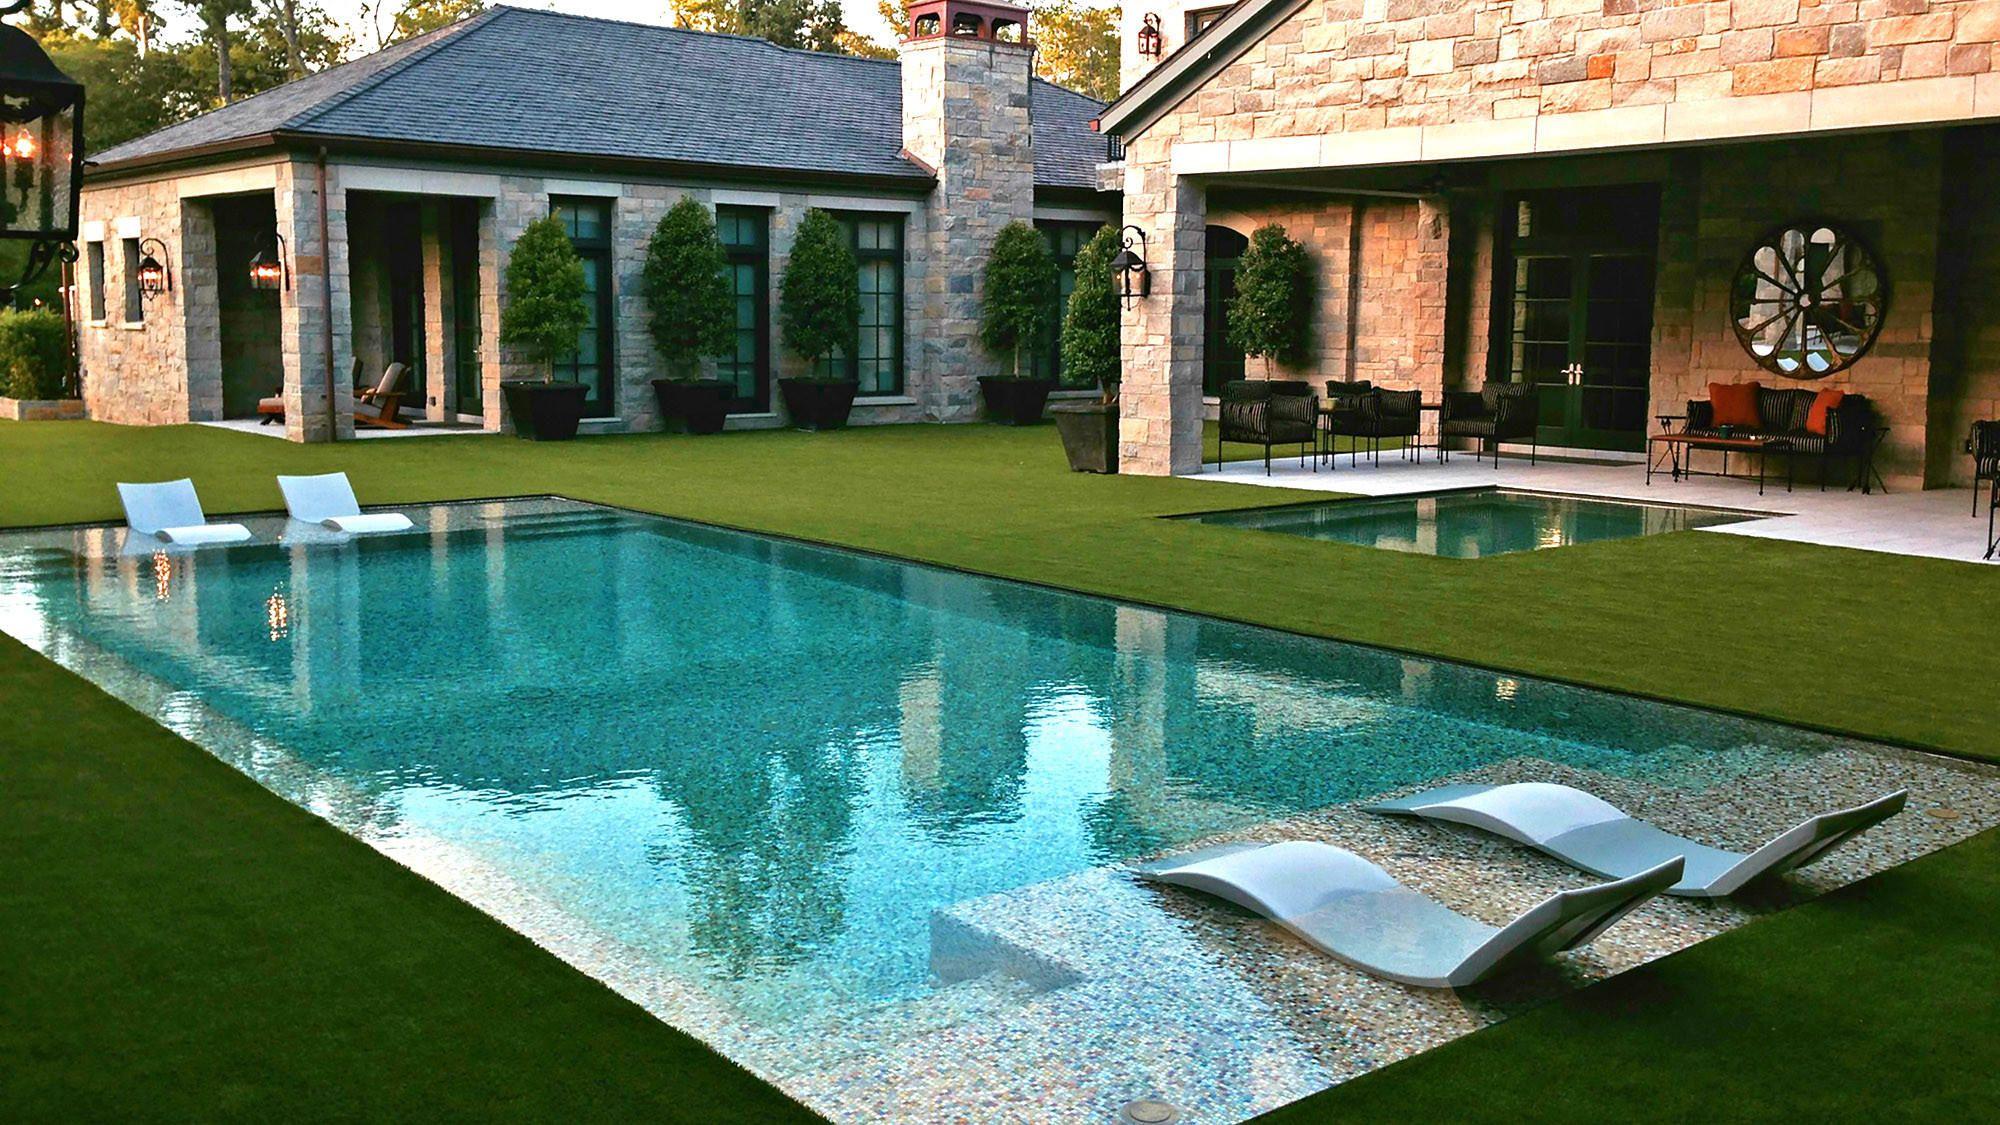 Grass Edge Peekaboo Refresh Your Backyard With The Latest Pool